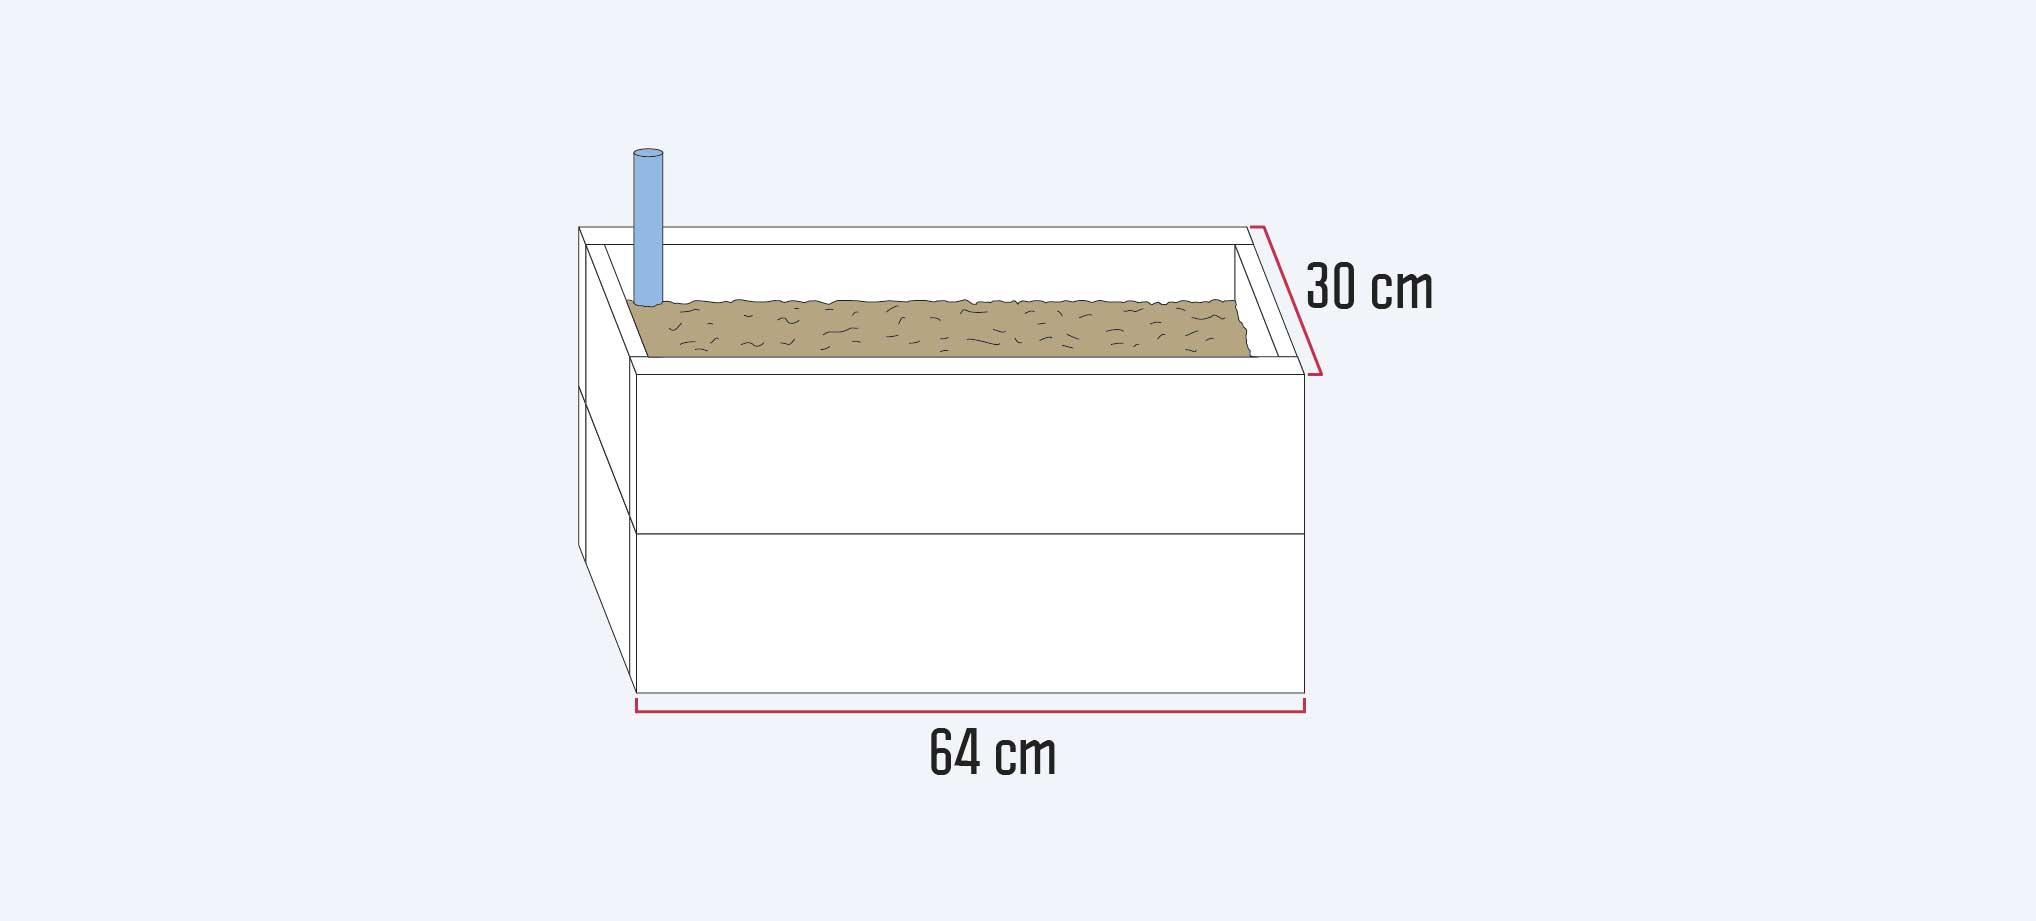 caja de 64 x 30 cm